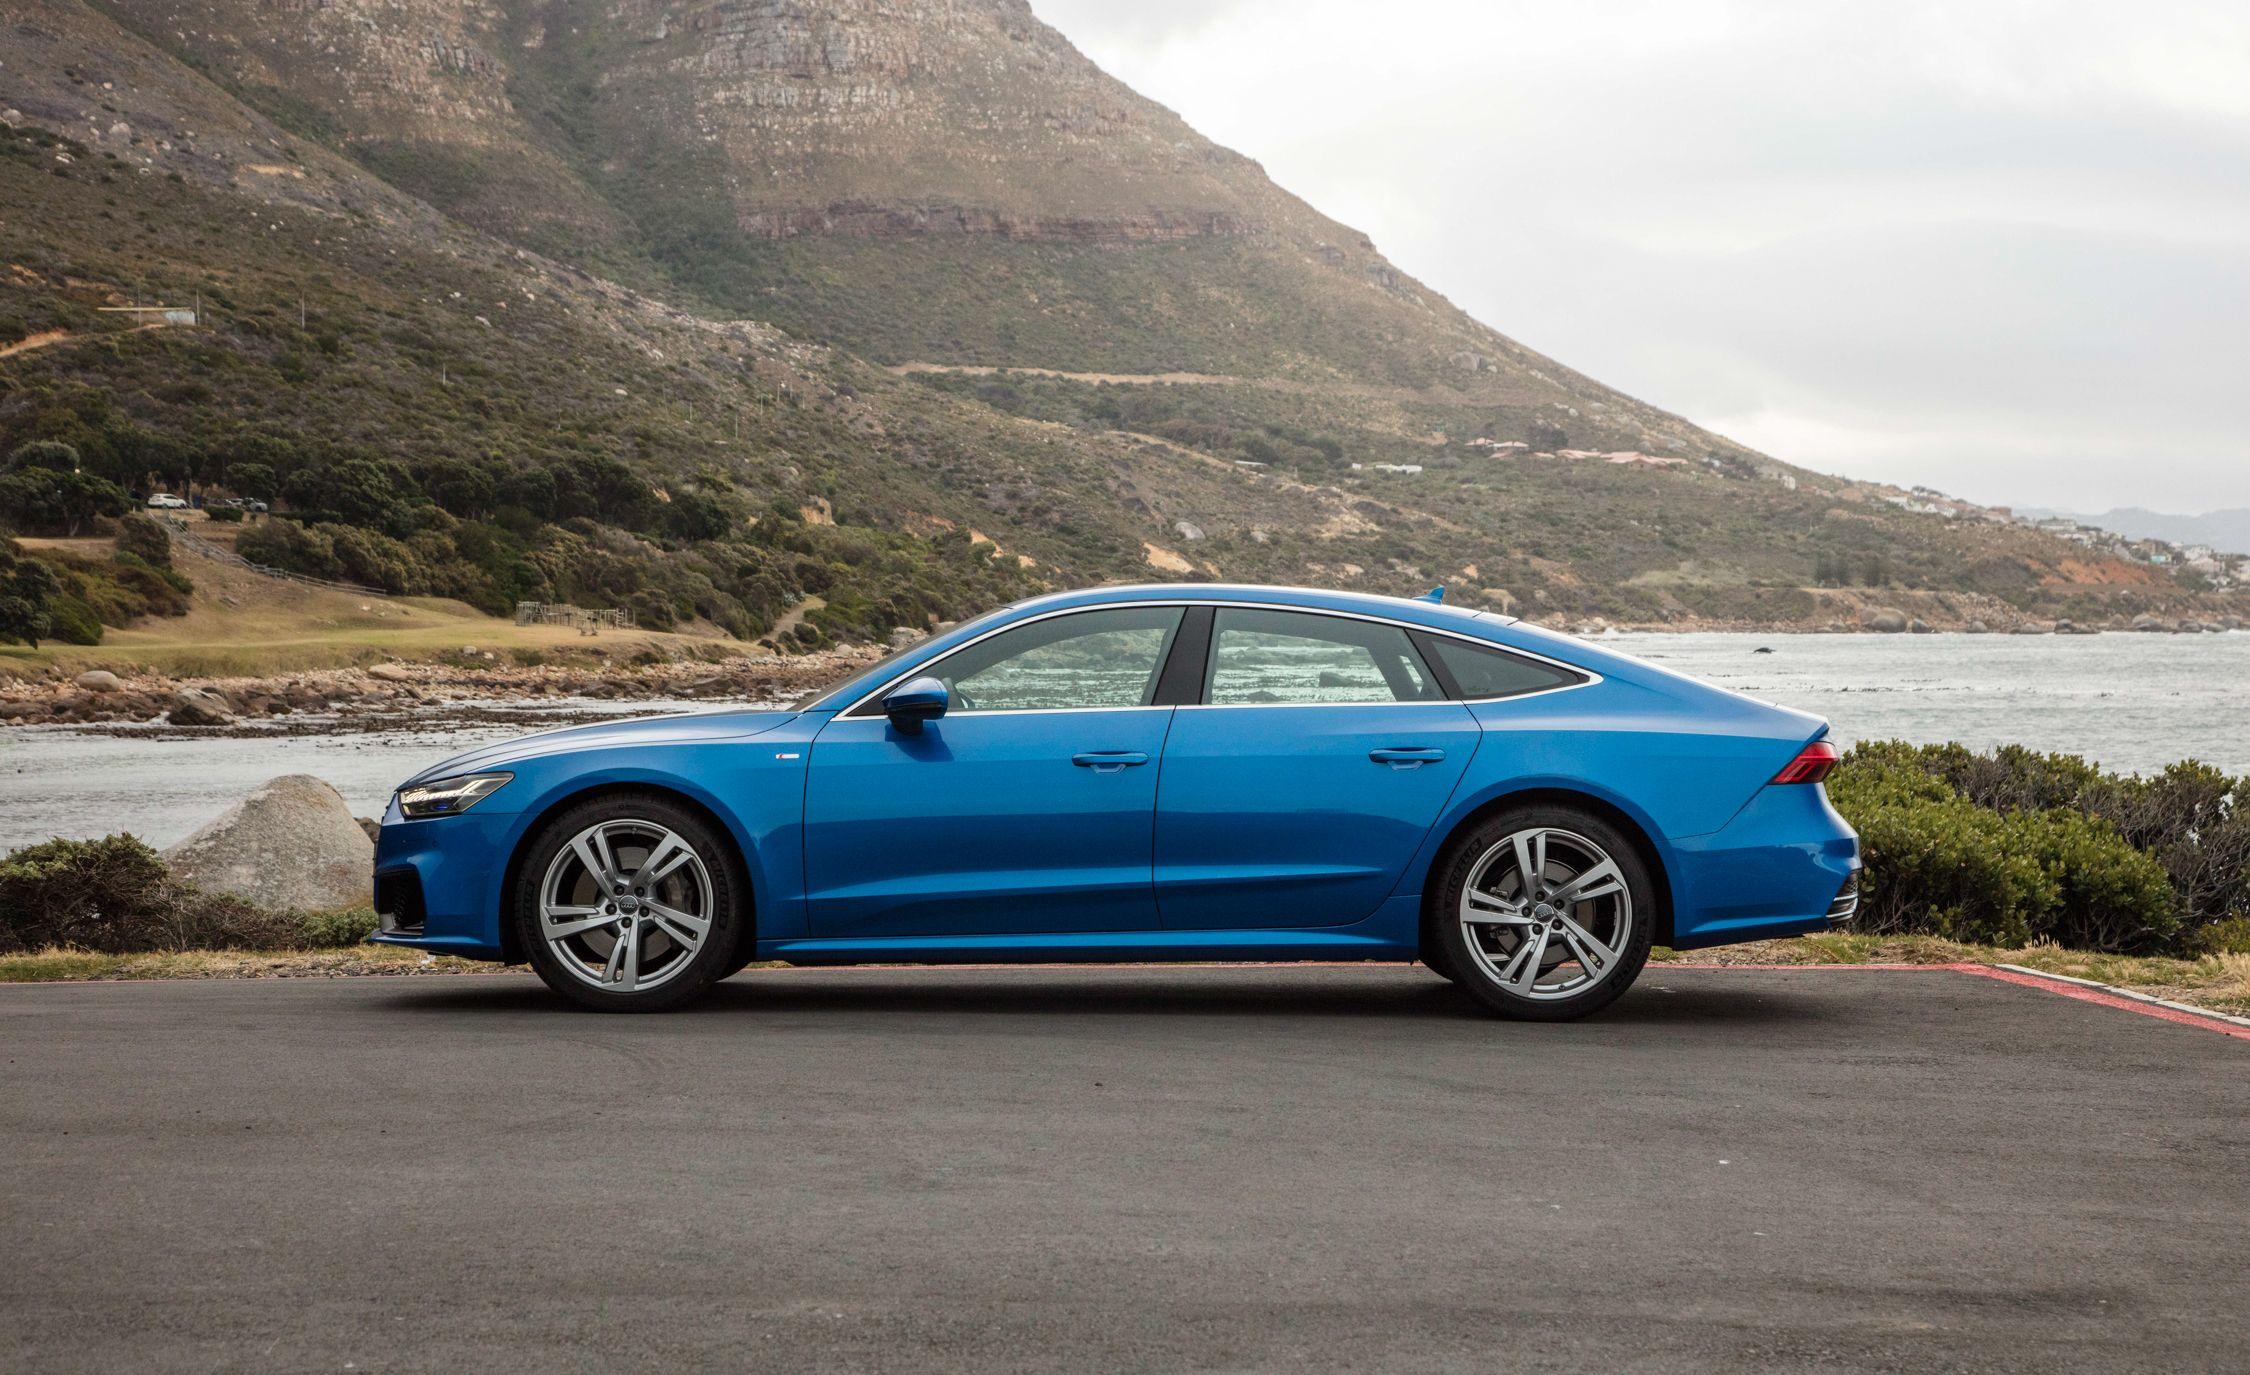 2019-Audi-A7-Sportback-121-1.jpg